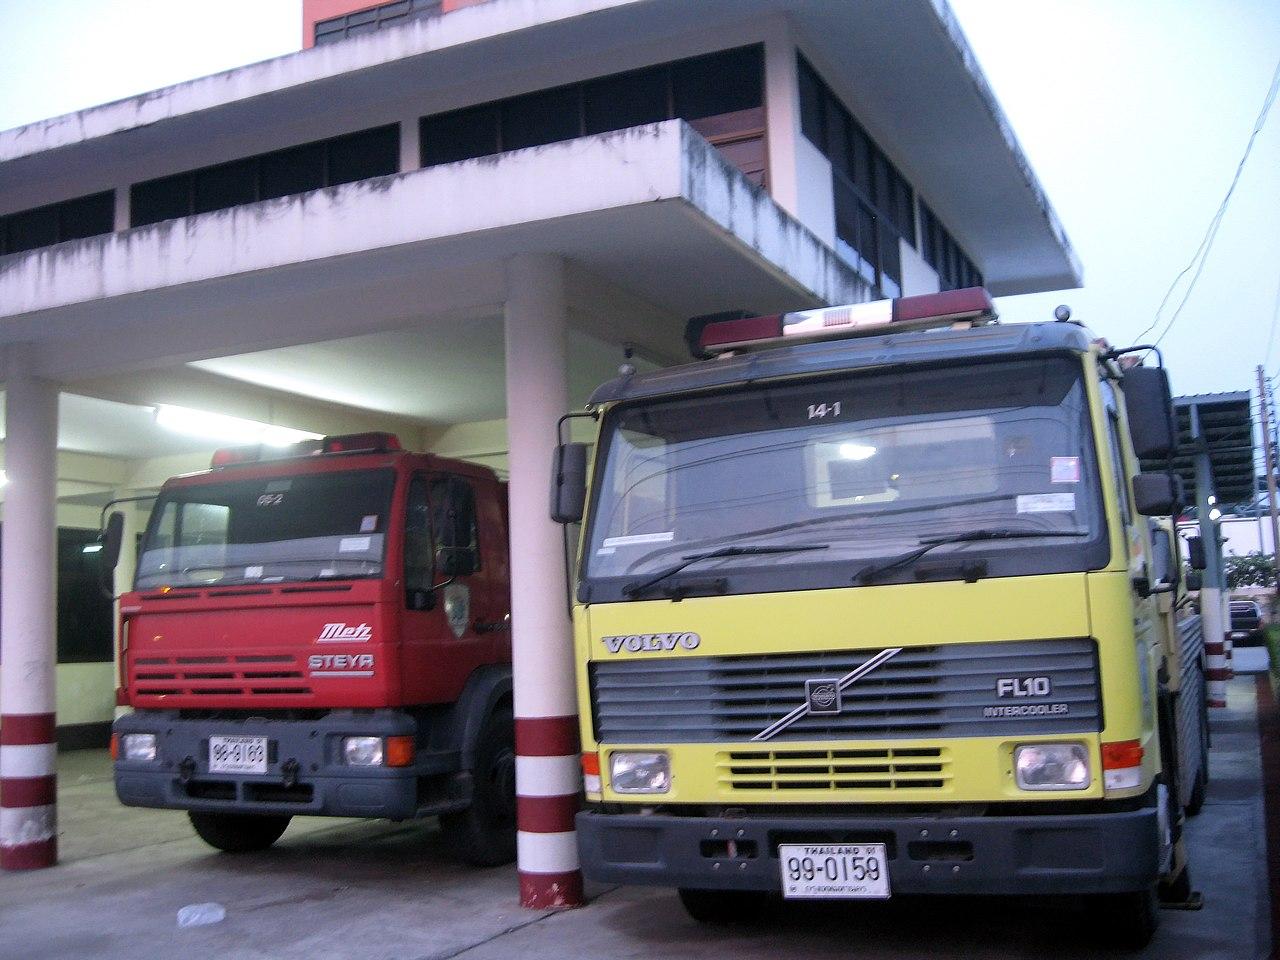 Fire breaks out at state quarantine hotel in Samut Prakan last night